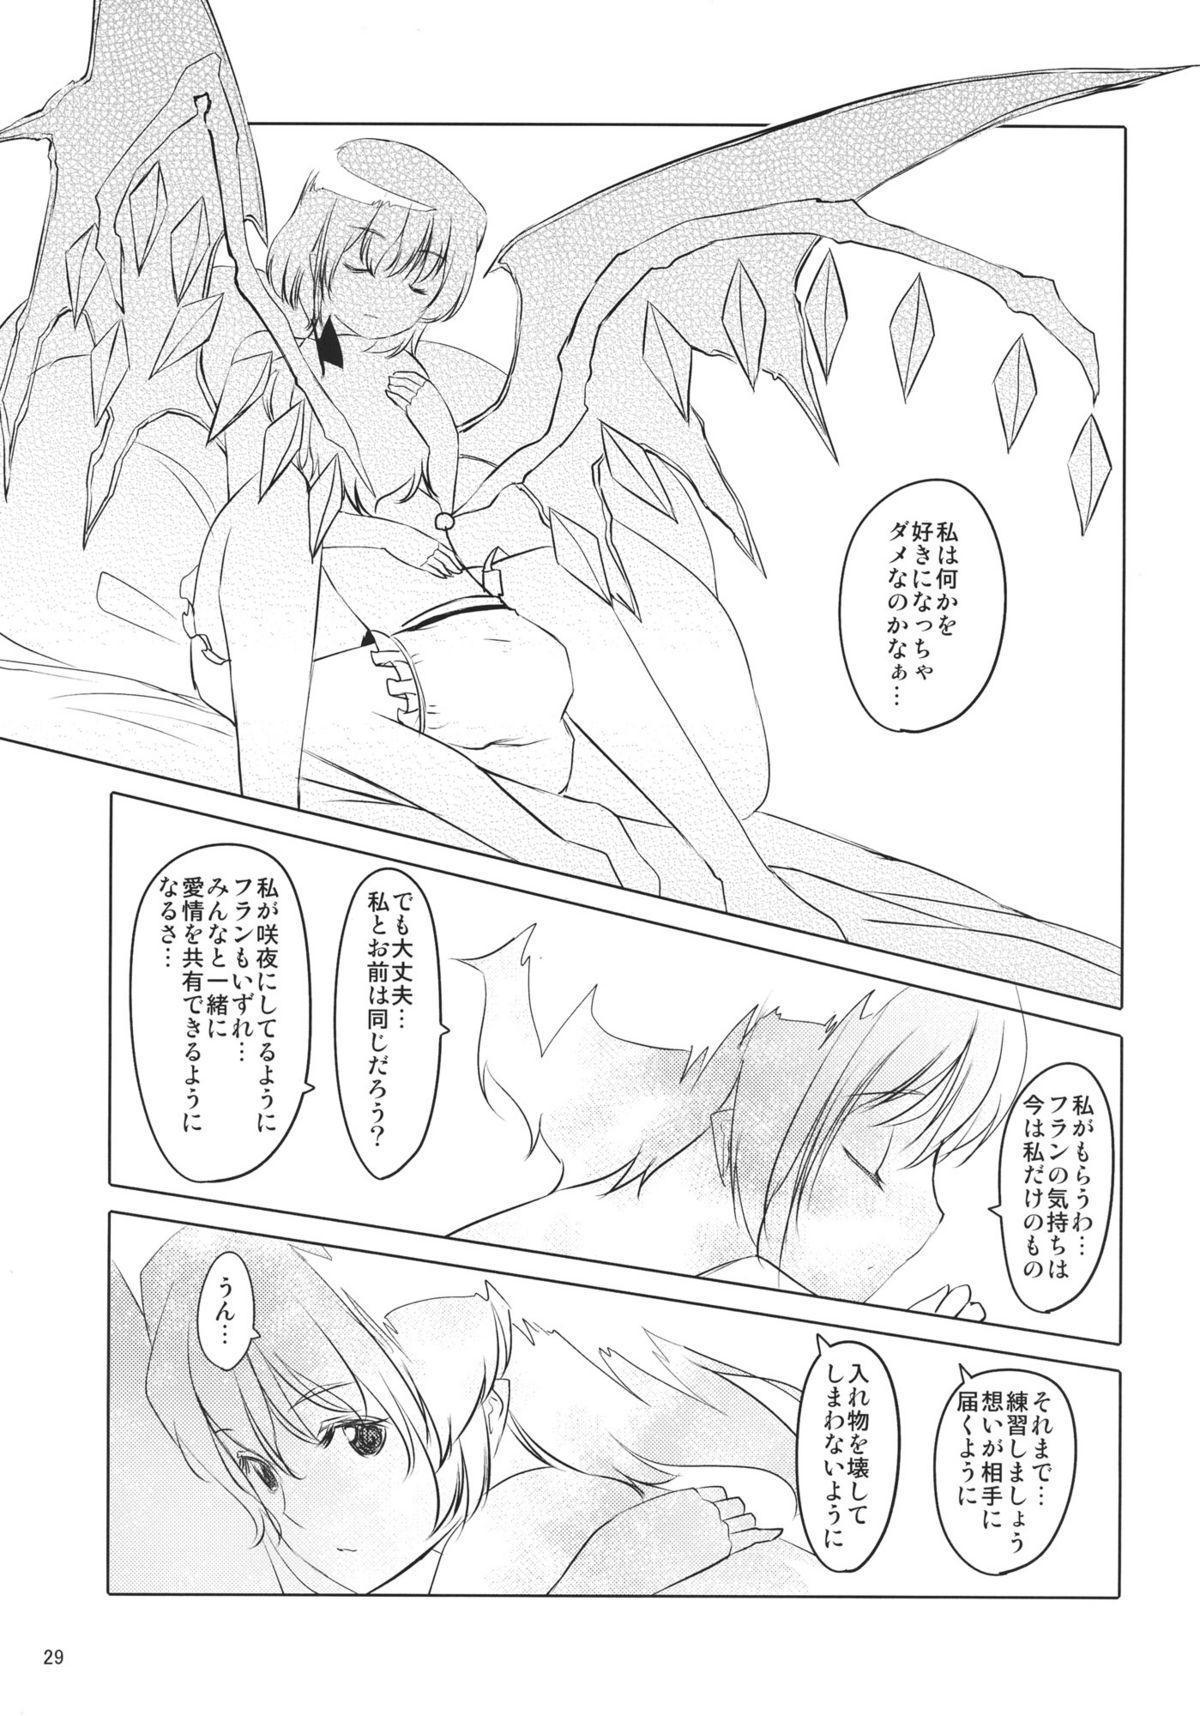 Flan-chan Infinity 30